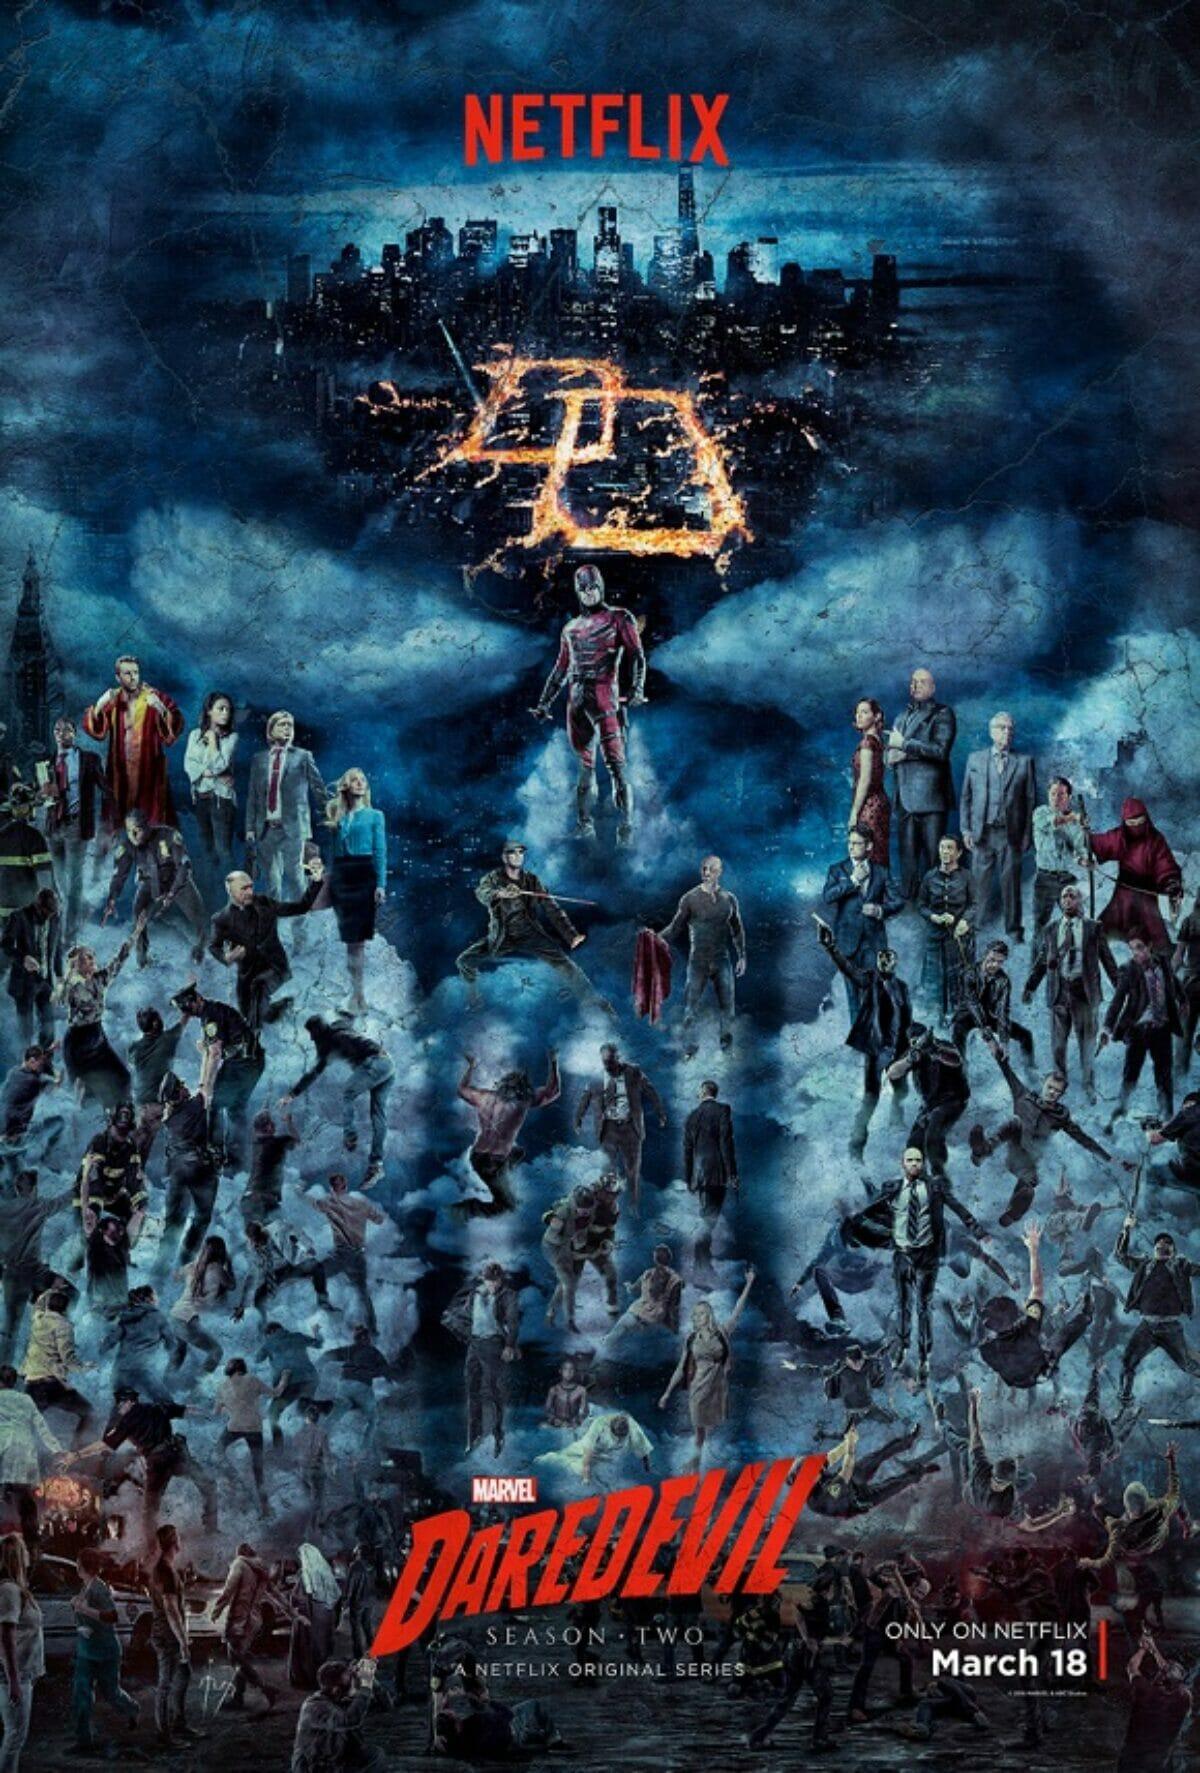 Daredevil-saison-2-poster1